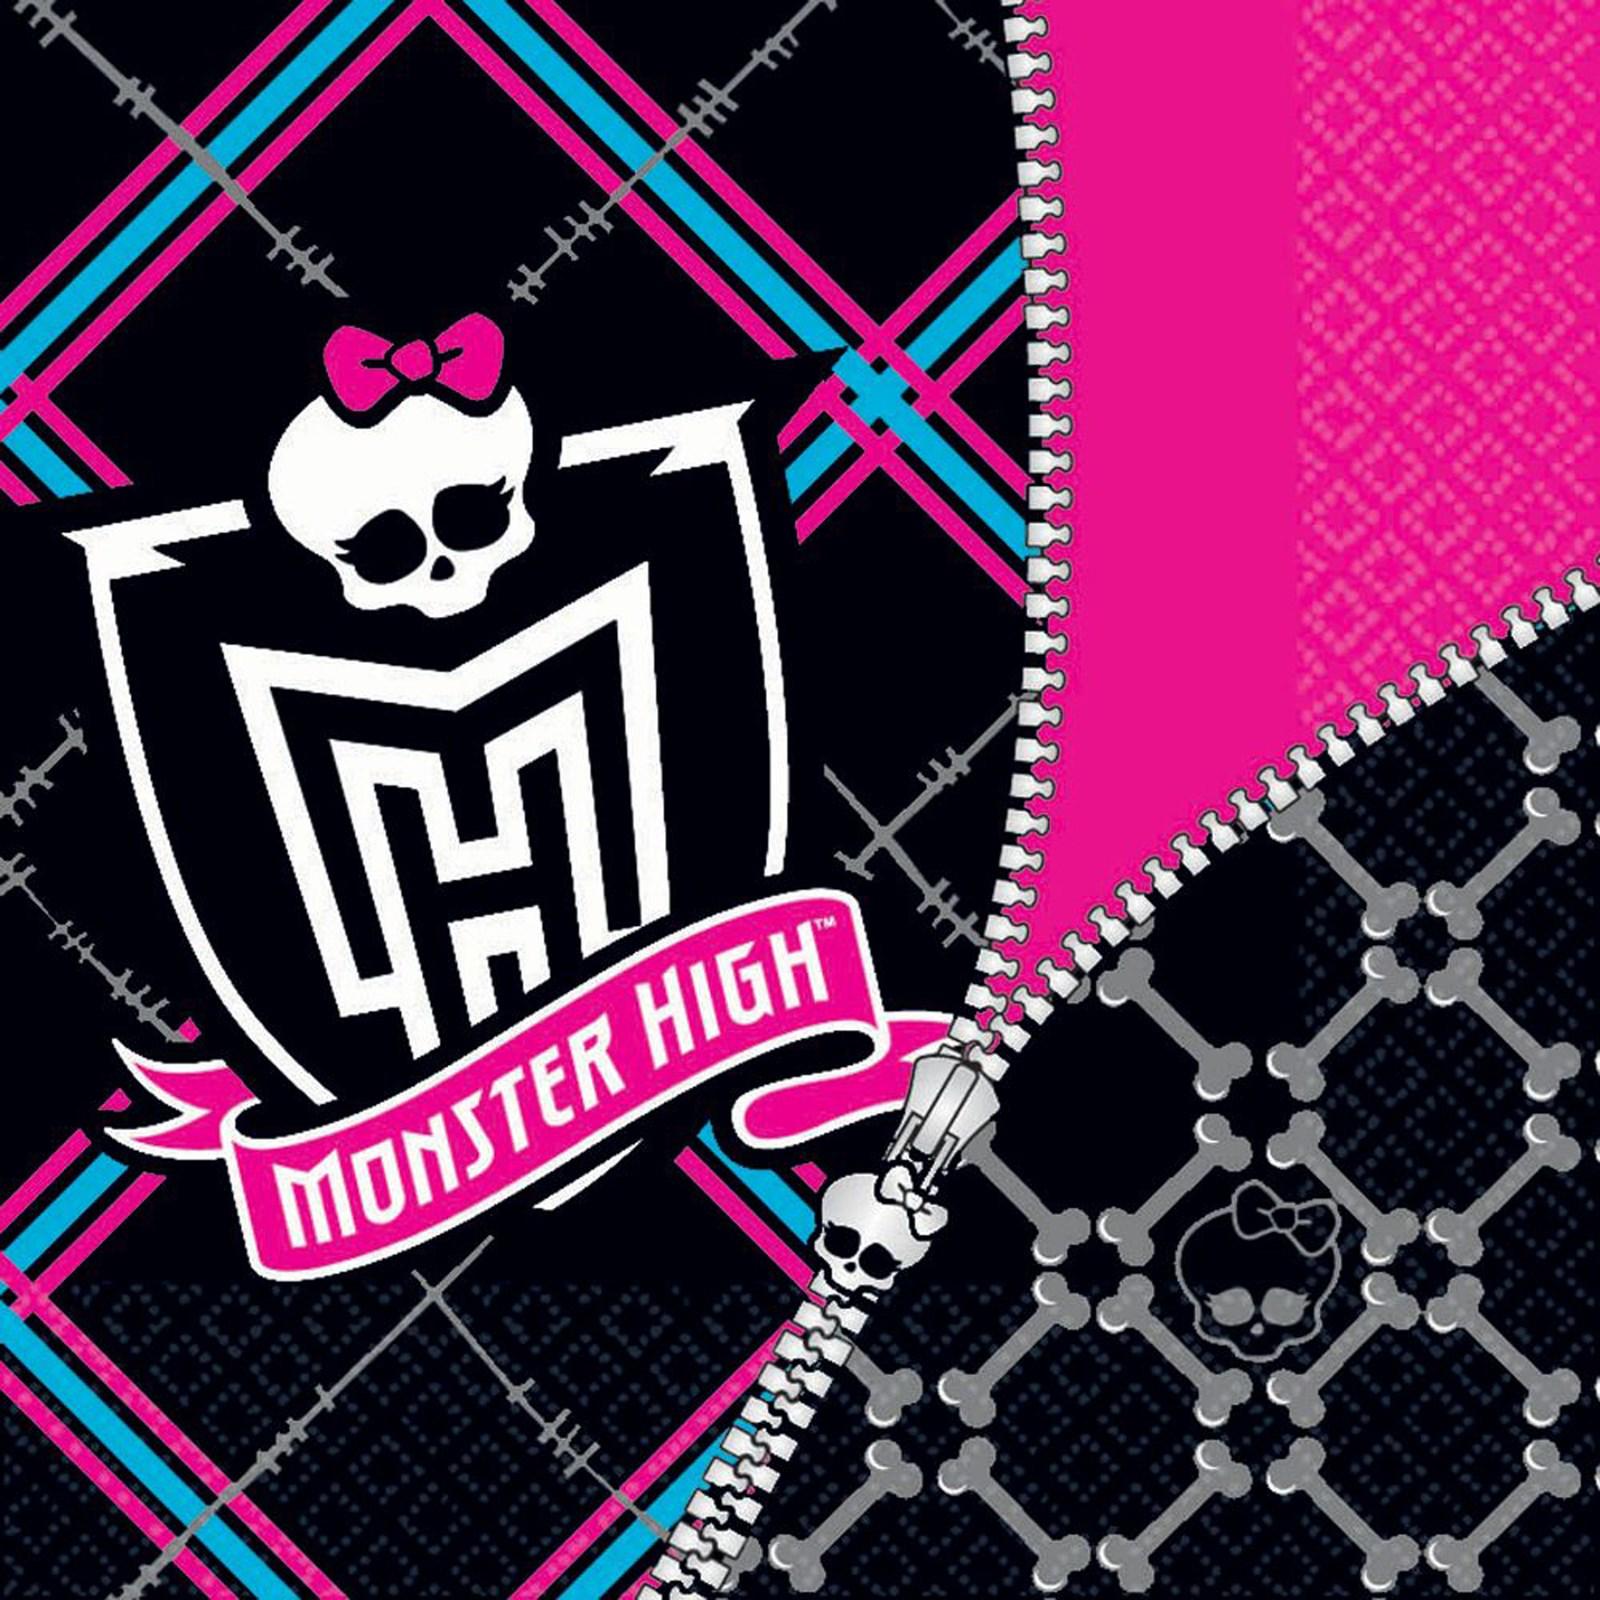 Monster High Birthday Invitations – Monster High Birthday Invites